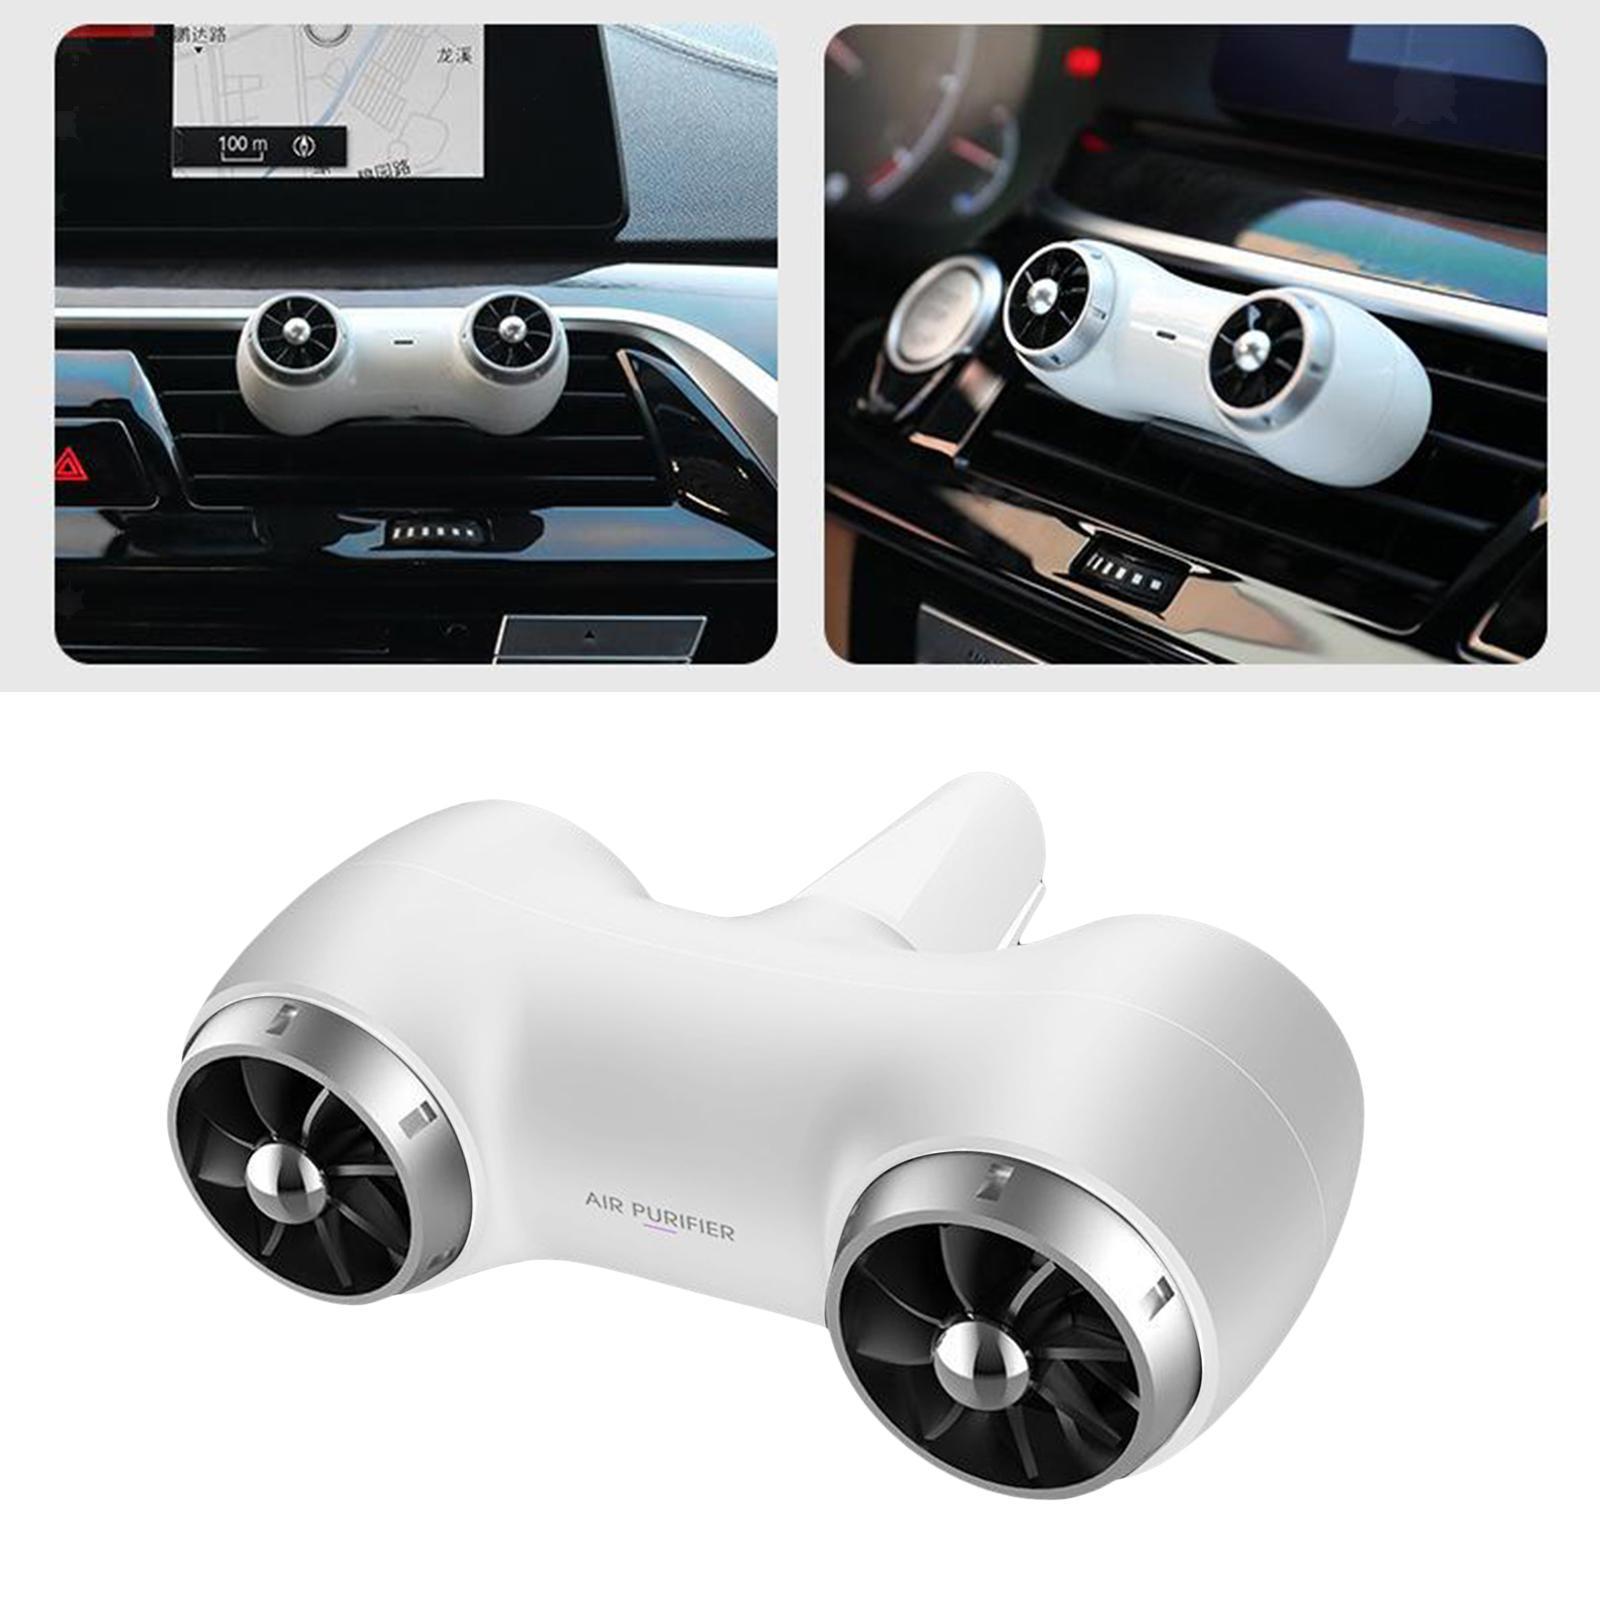 Indexbild 3 - Car Air Purifier Deodorizer Vehicles Smoke Eliminator Dust Air Freshener